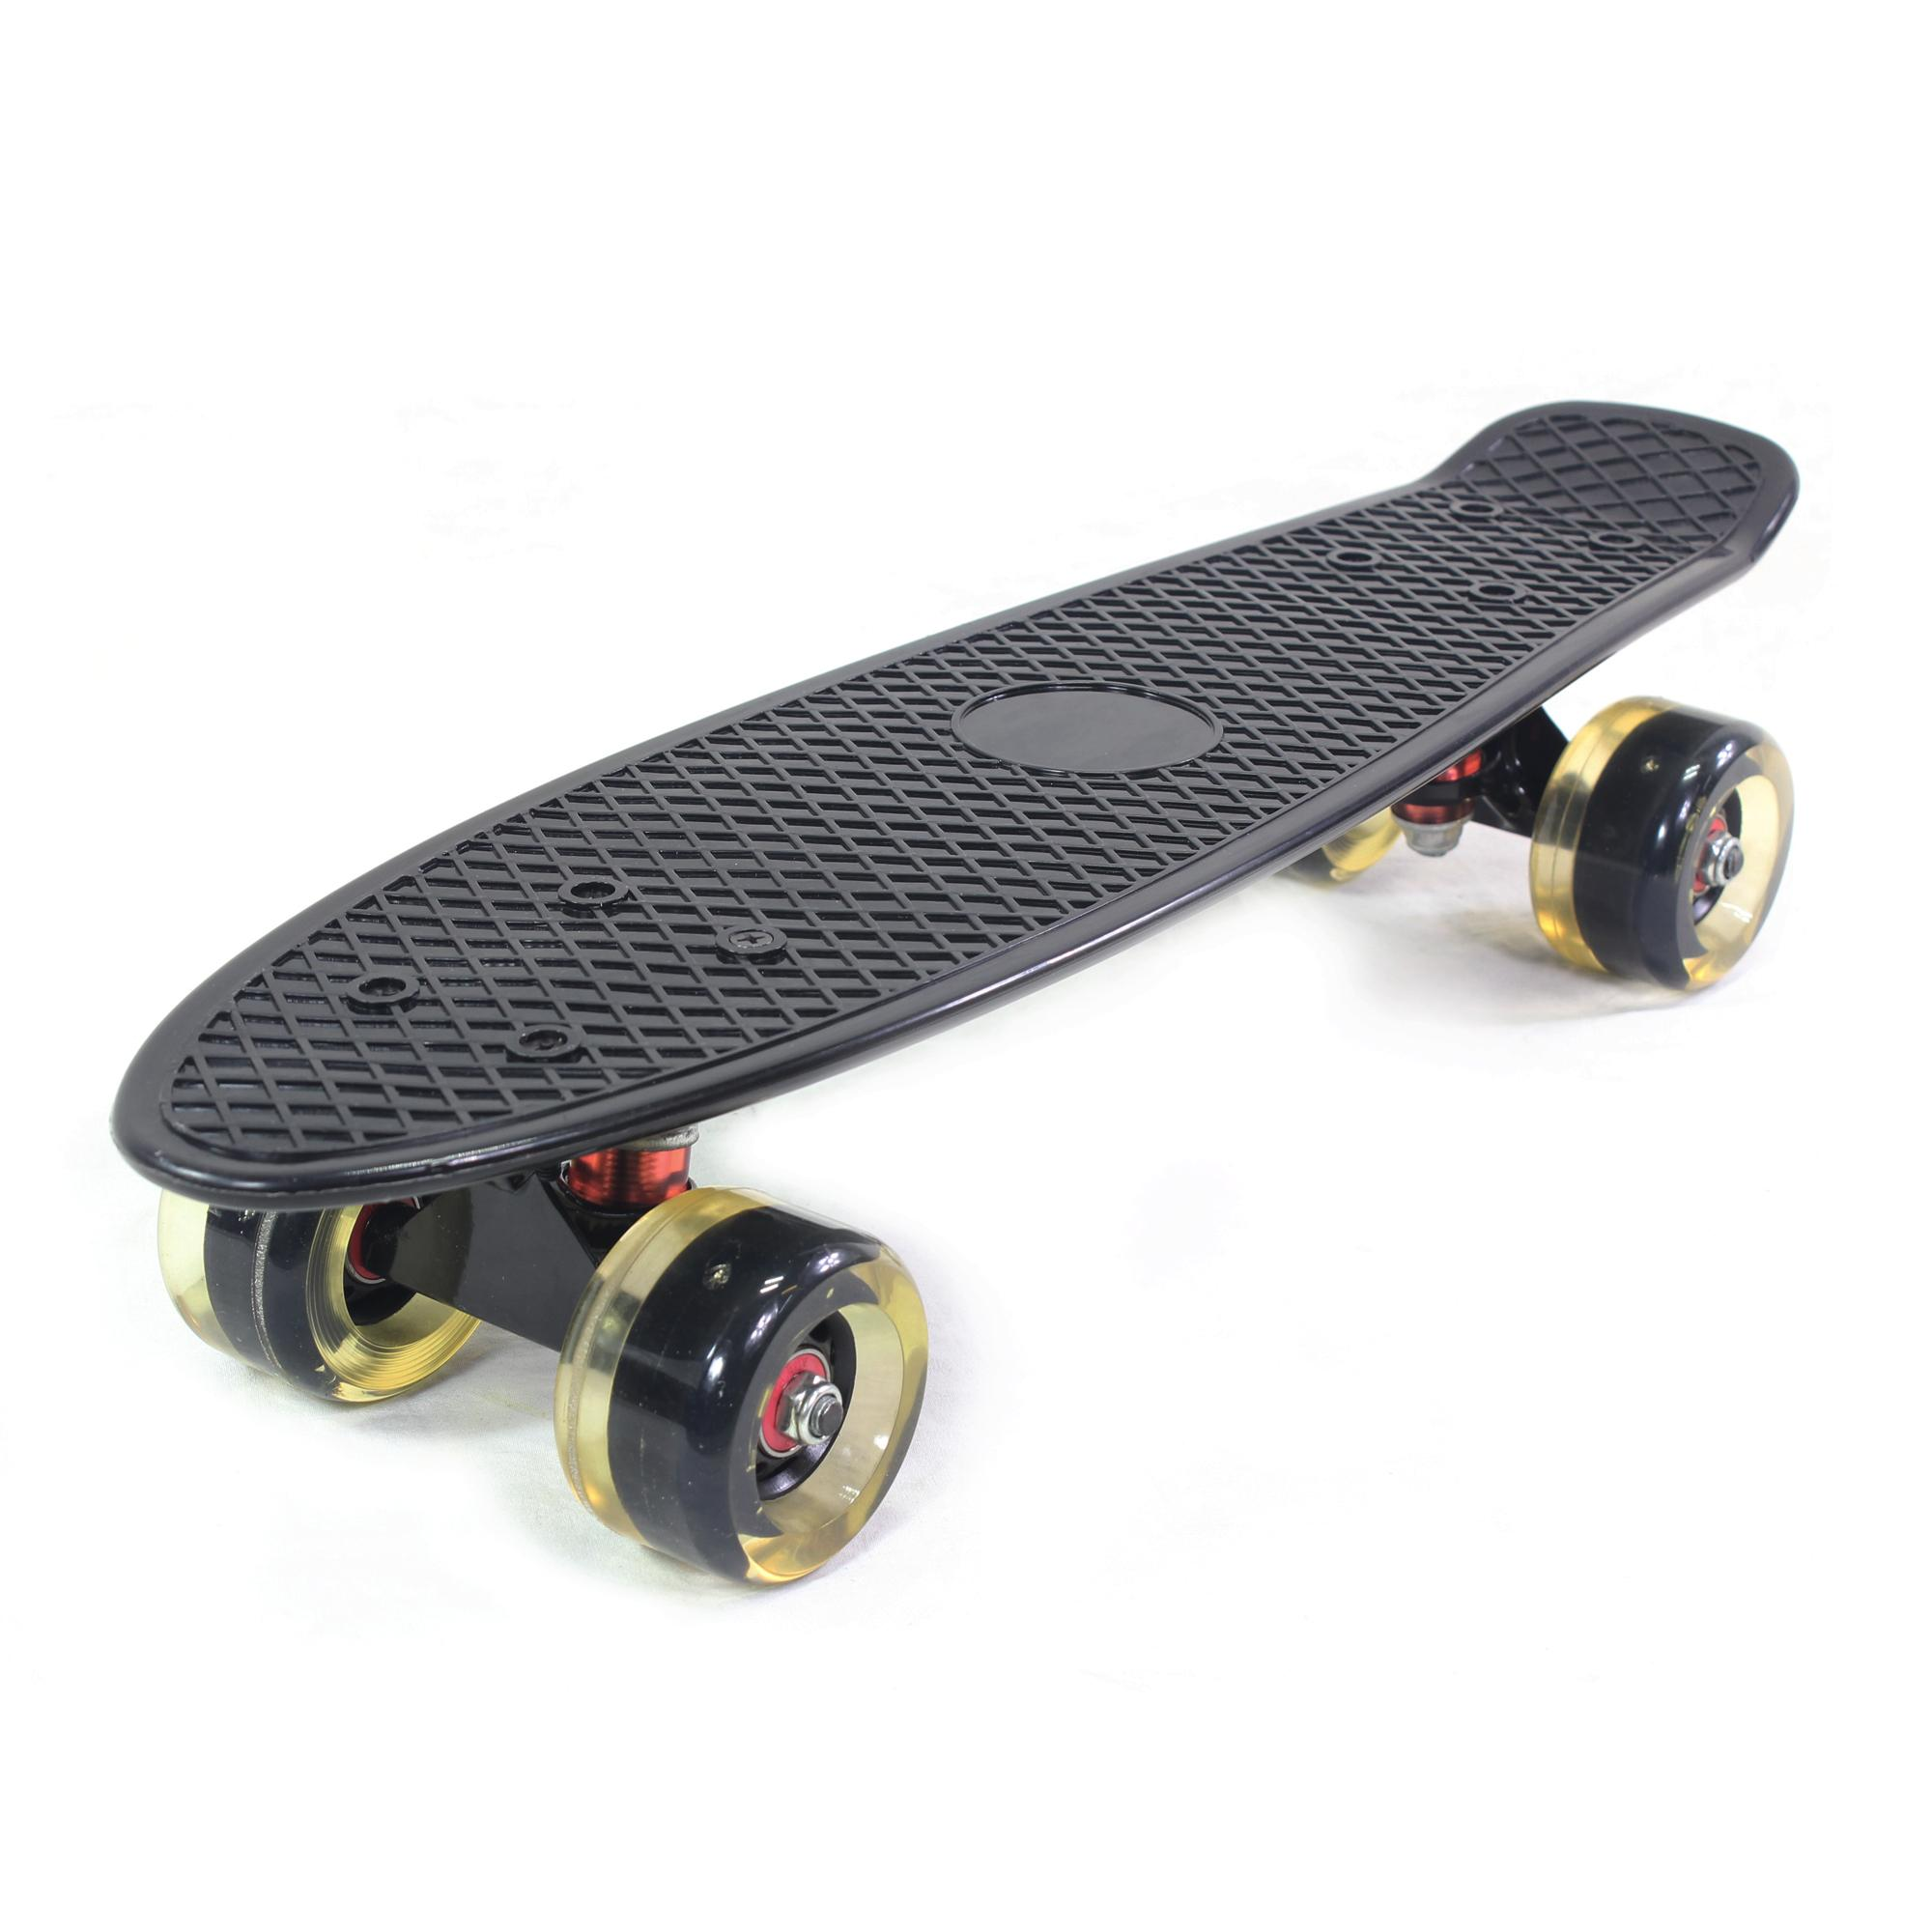 Skateboards For Sale Skateboard Variants Online Brands Prices Swag Chandelier Ebay Electronics Cars Fashion Collectibles 22 Penny Board Pp Plastic Wheels Led Light Up